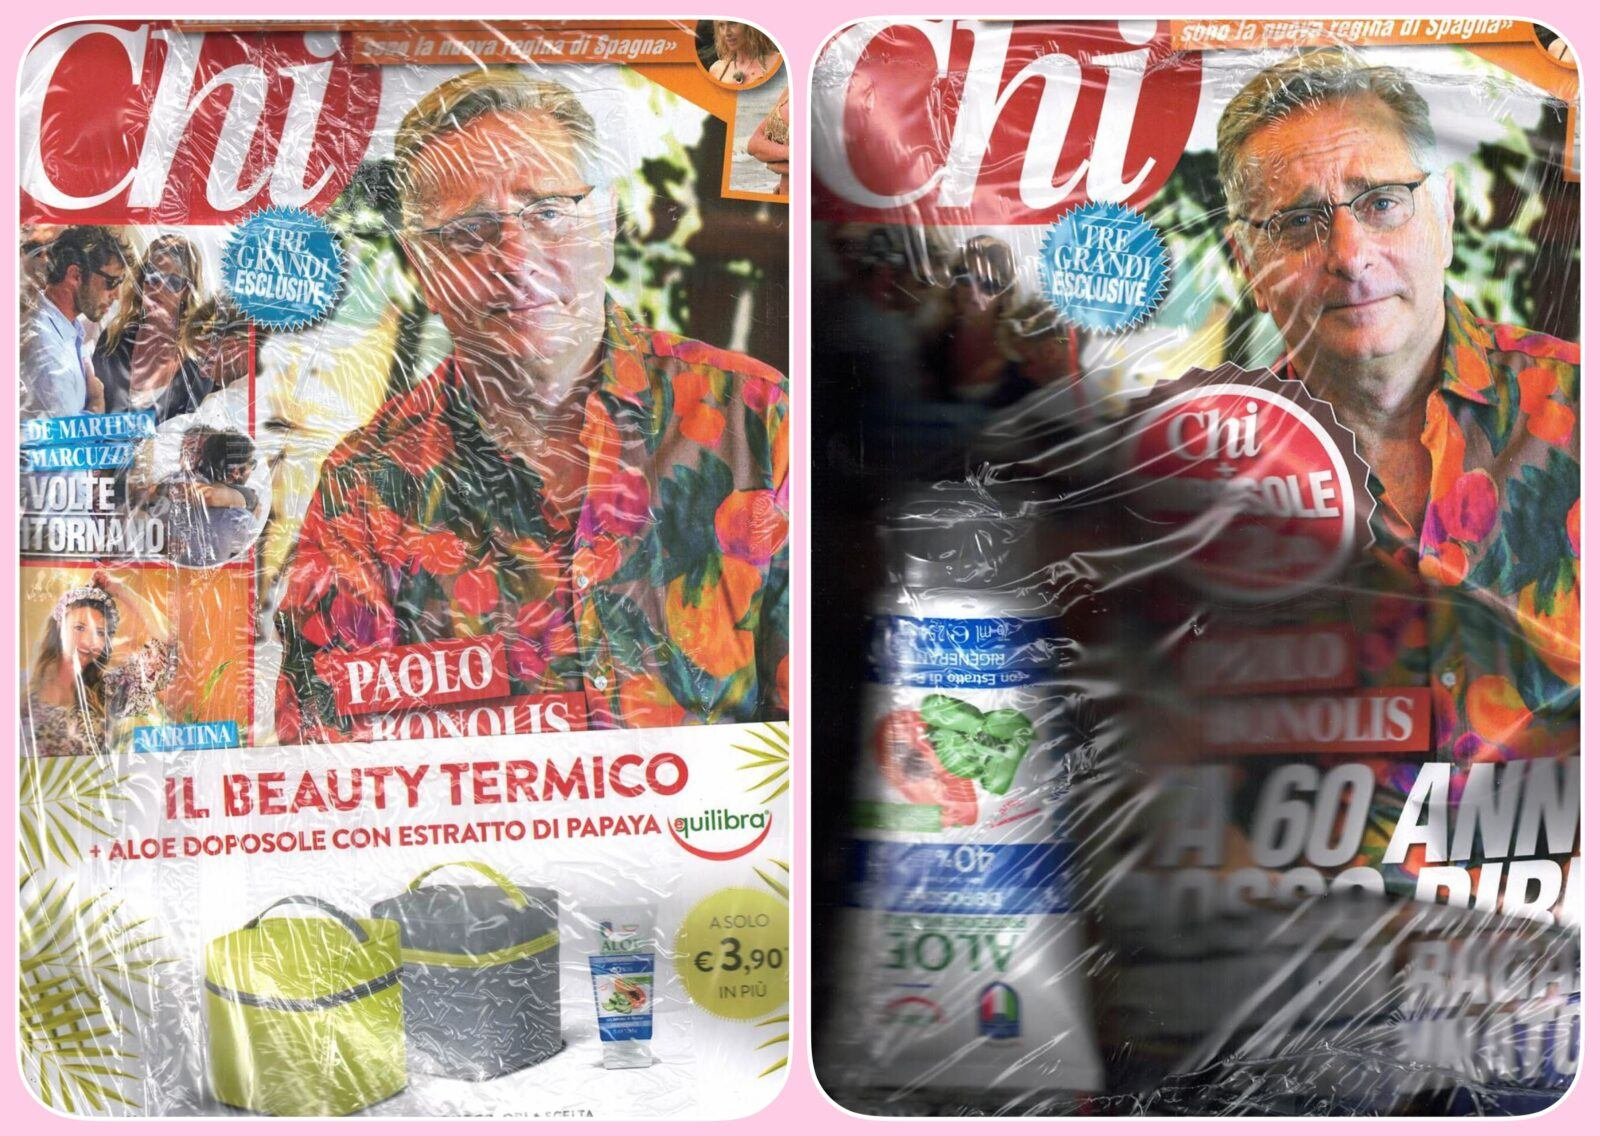 www.scontrinofelice.it img 7265 1600x1136 Affari in edicola: Chi + Doposole Equilibra + Beauty termico